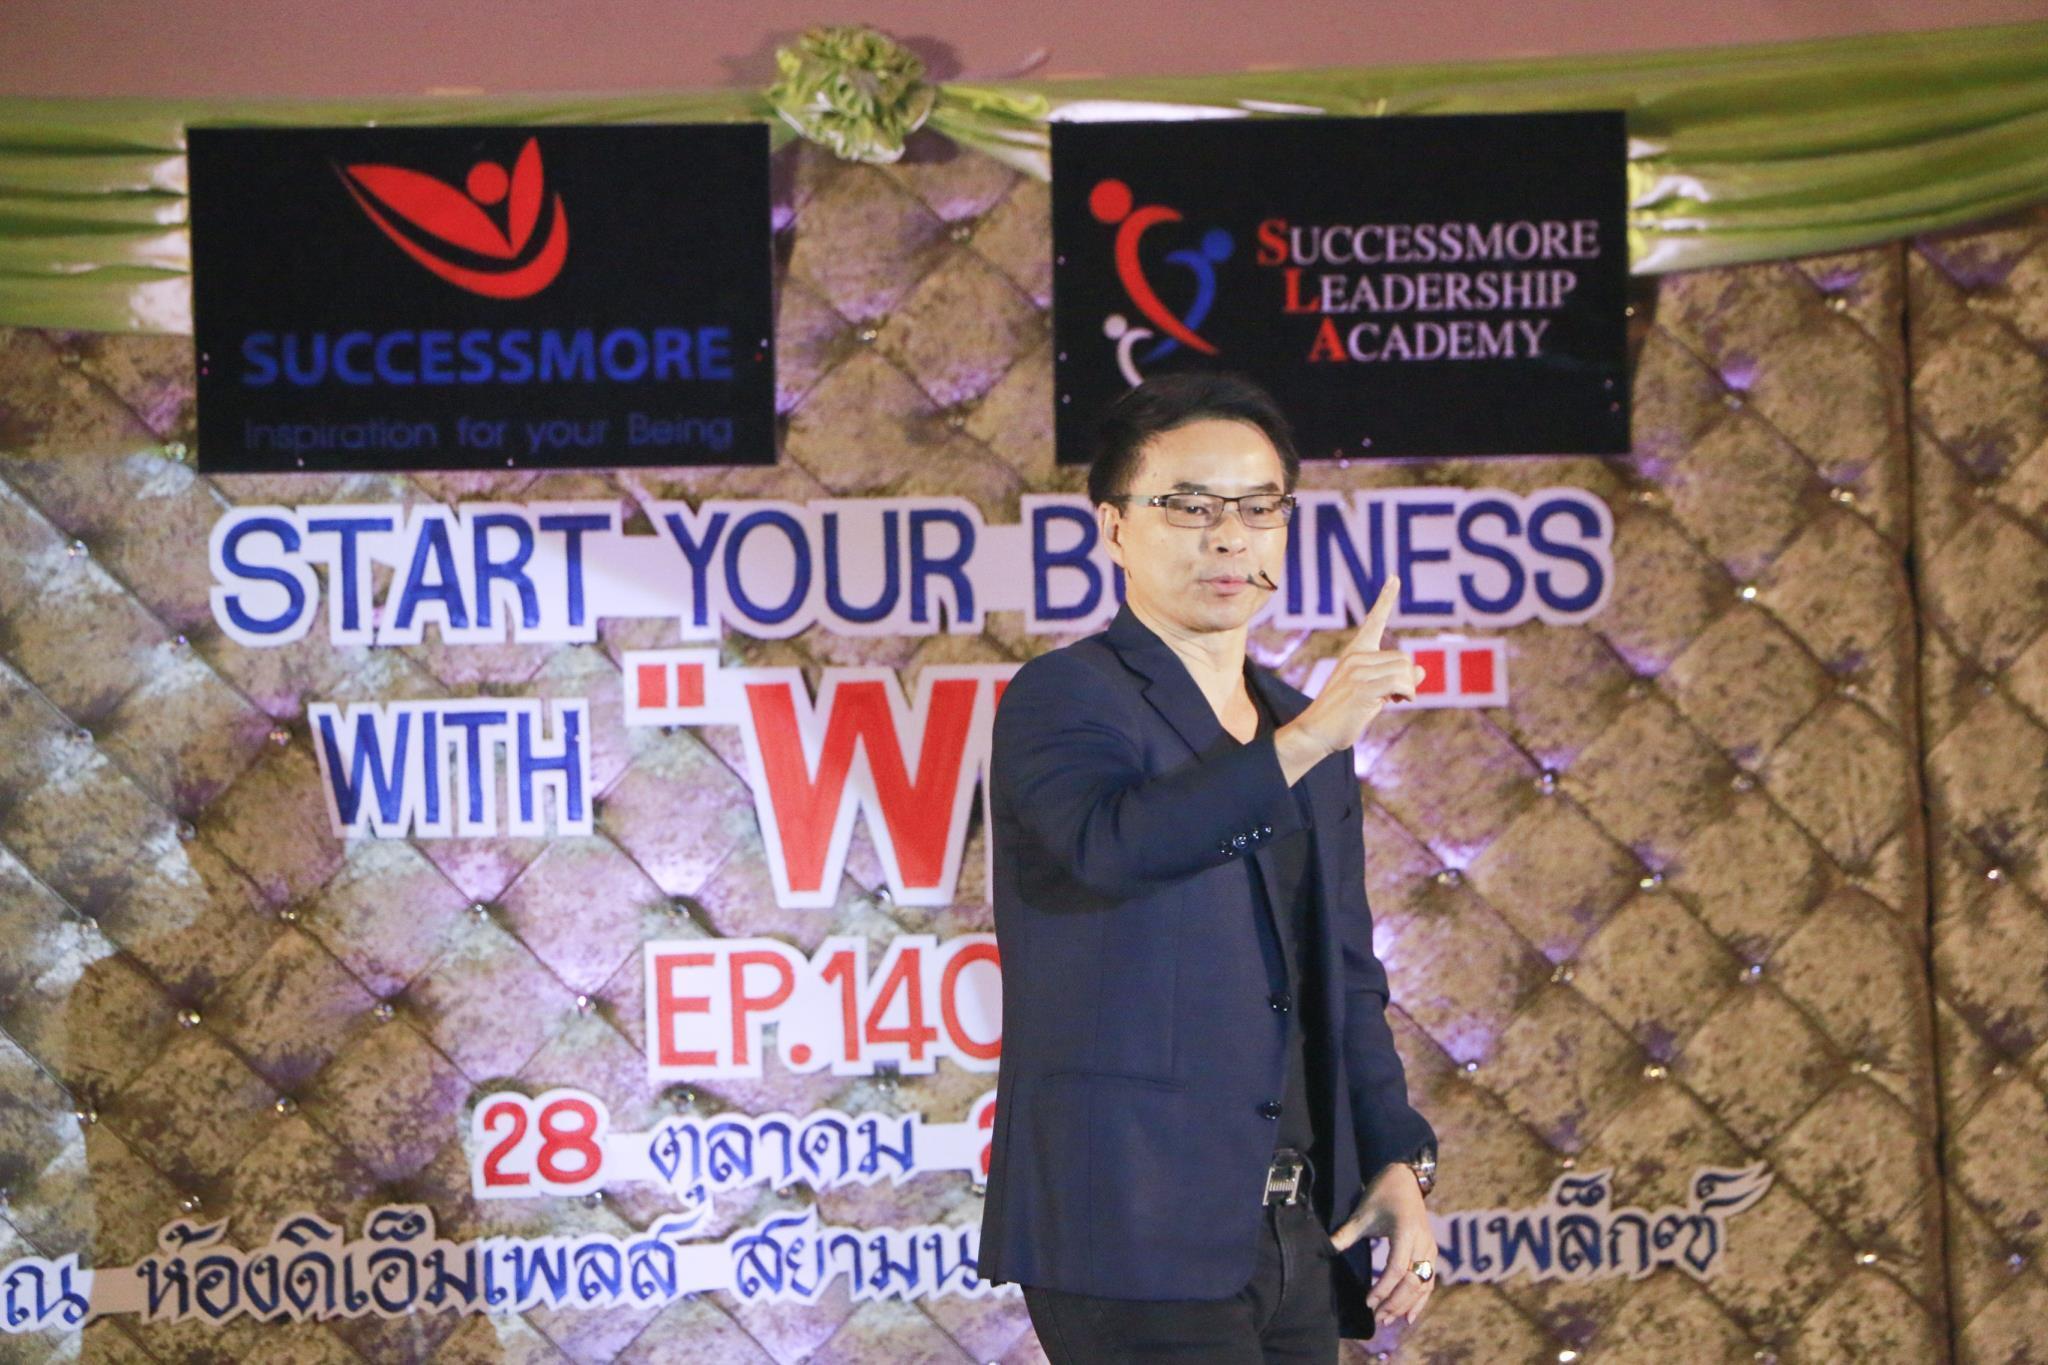 SUCCESSMORE WHY EP.140 จ.สงขลา (1)